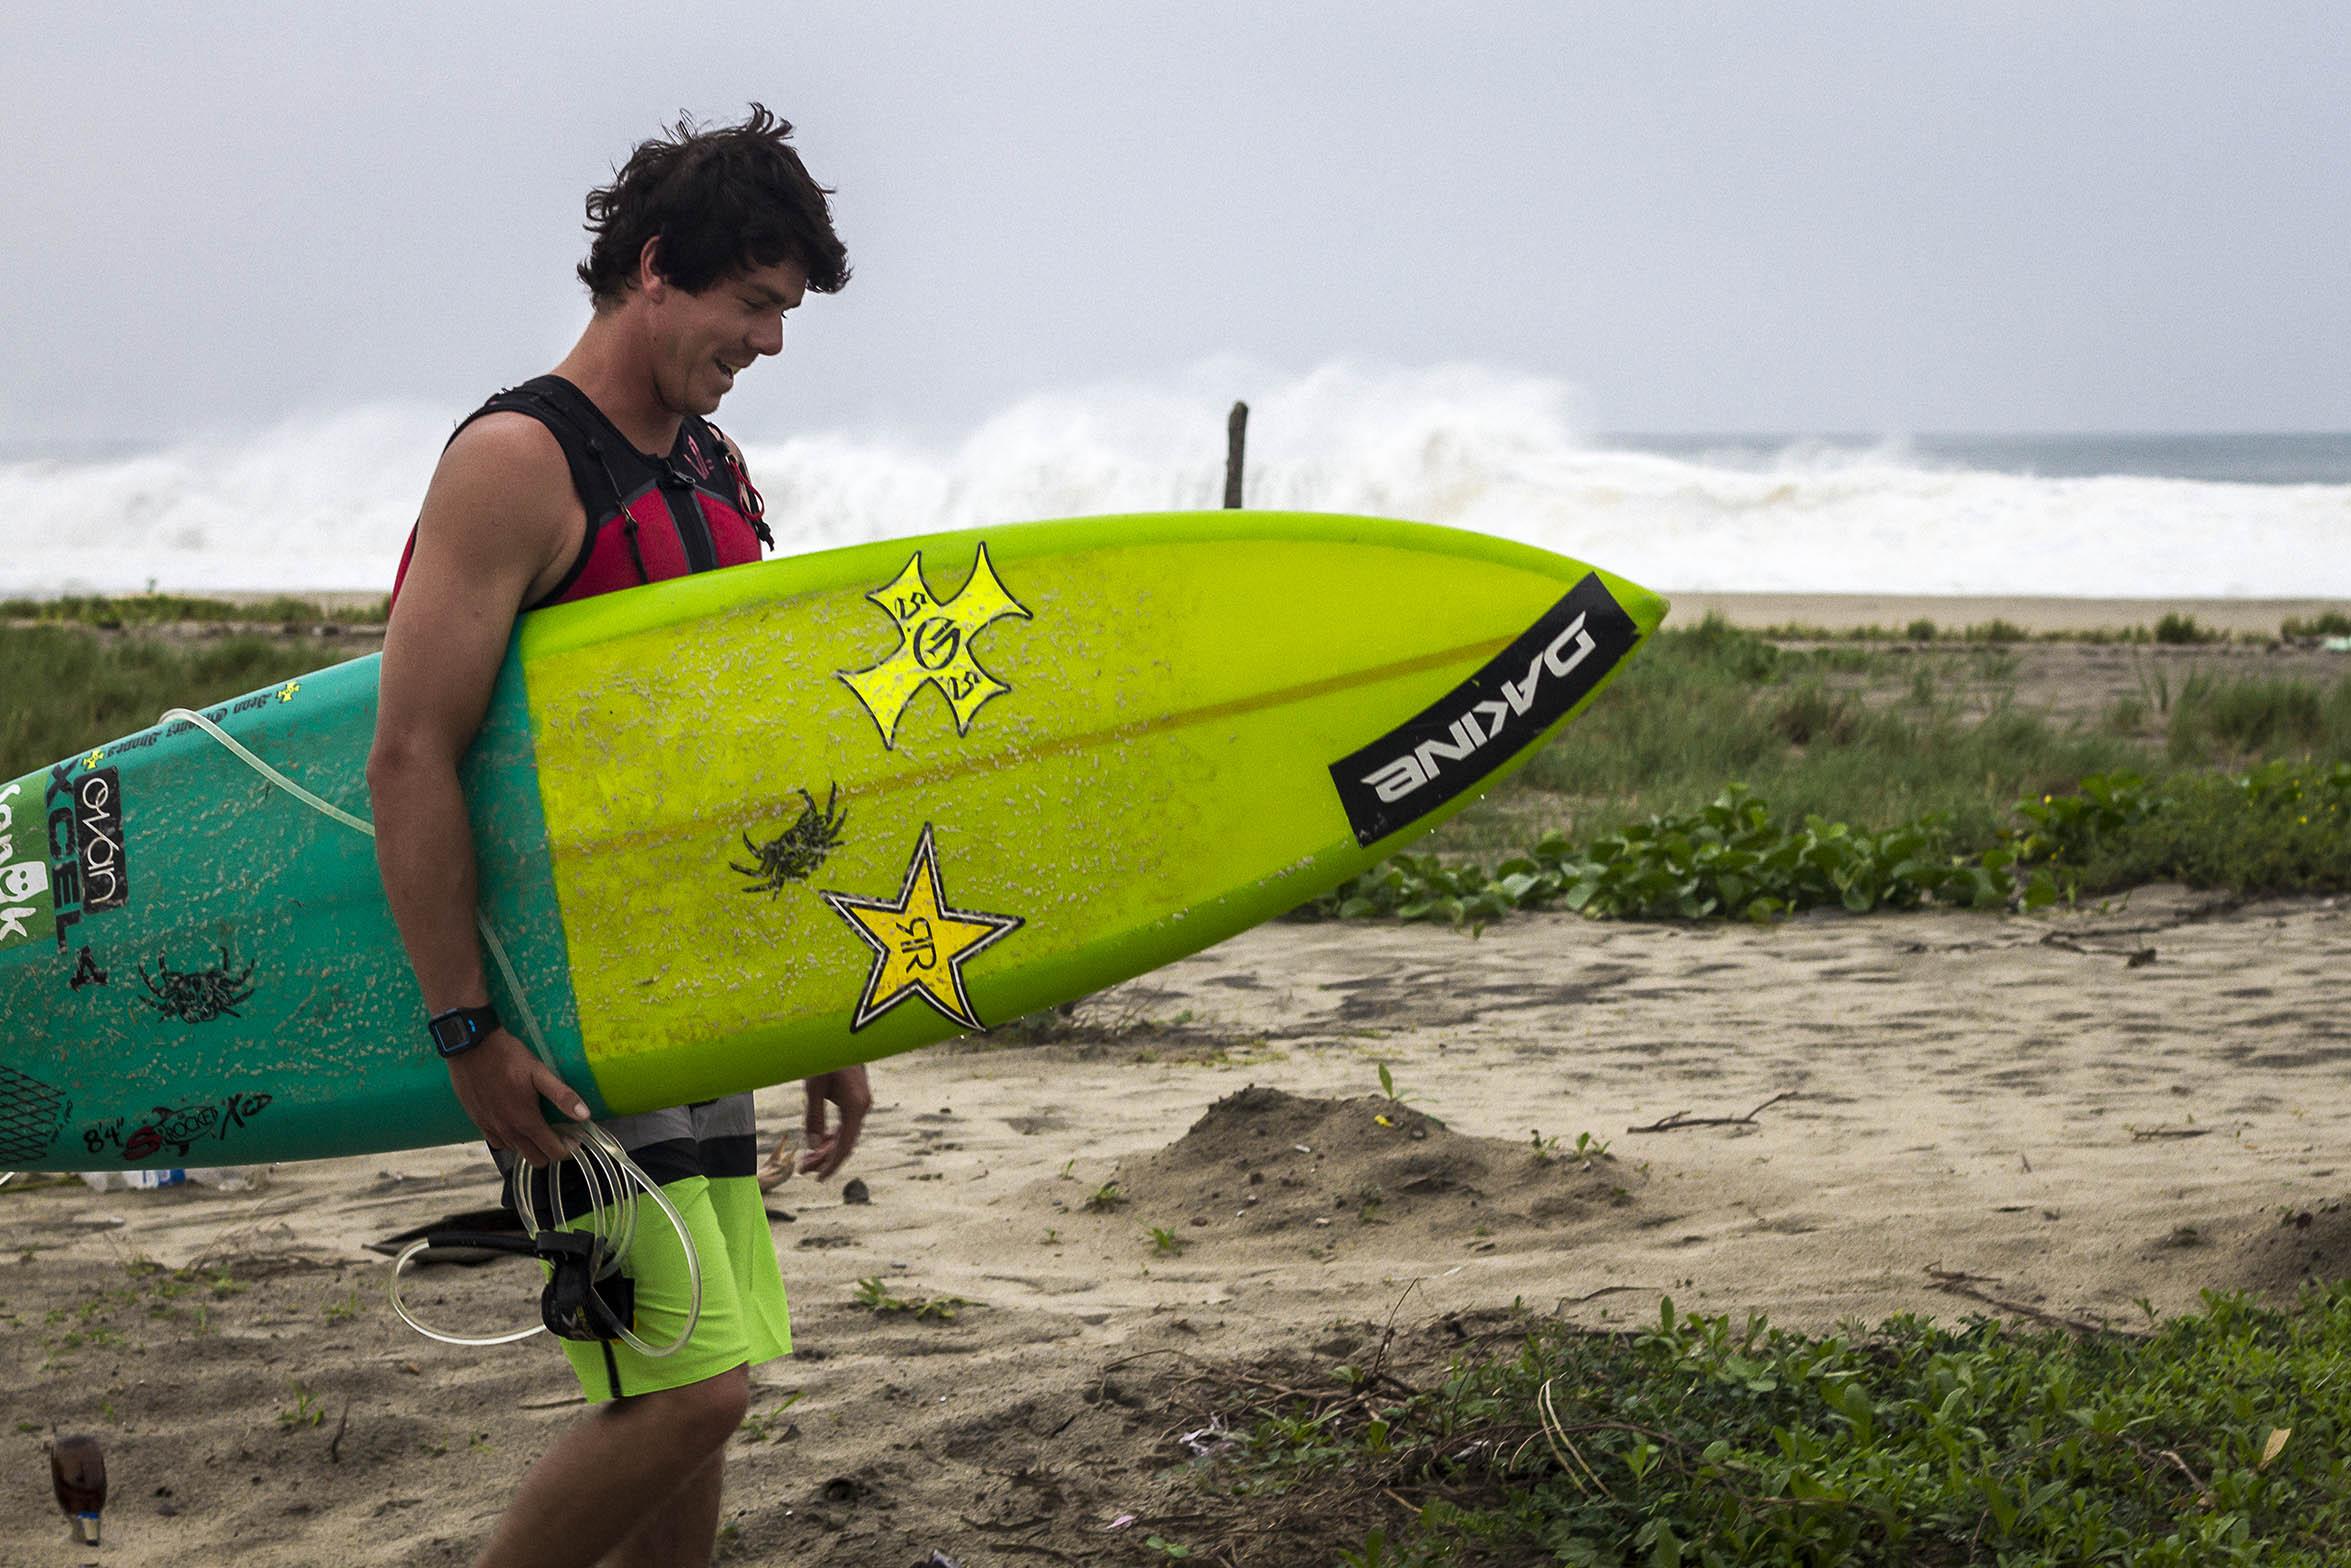 1surfboard